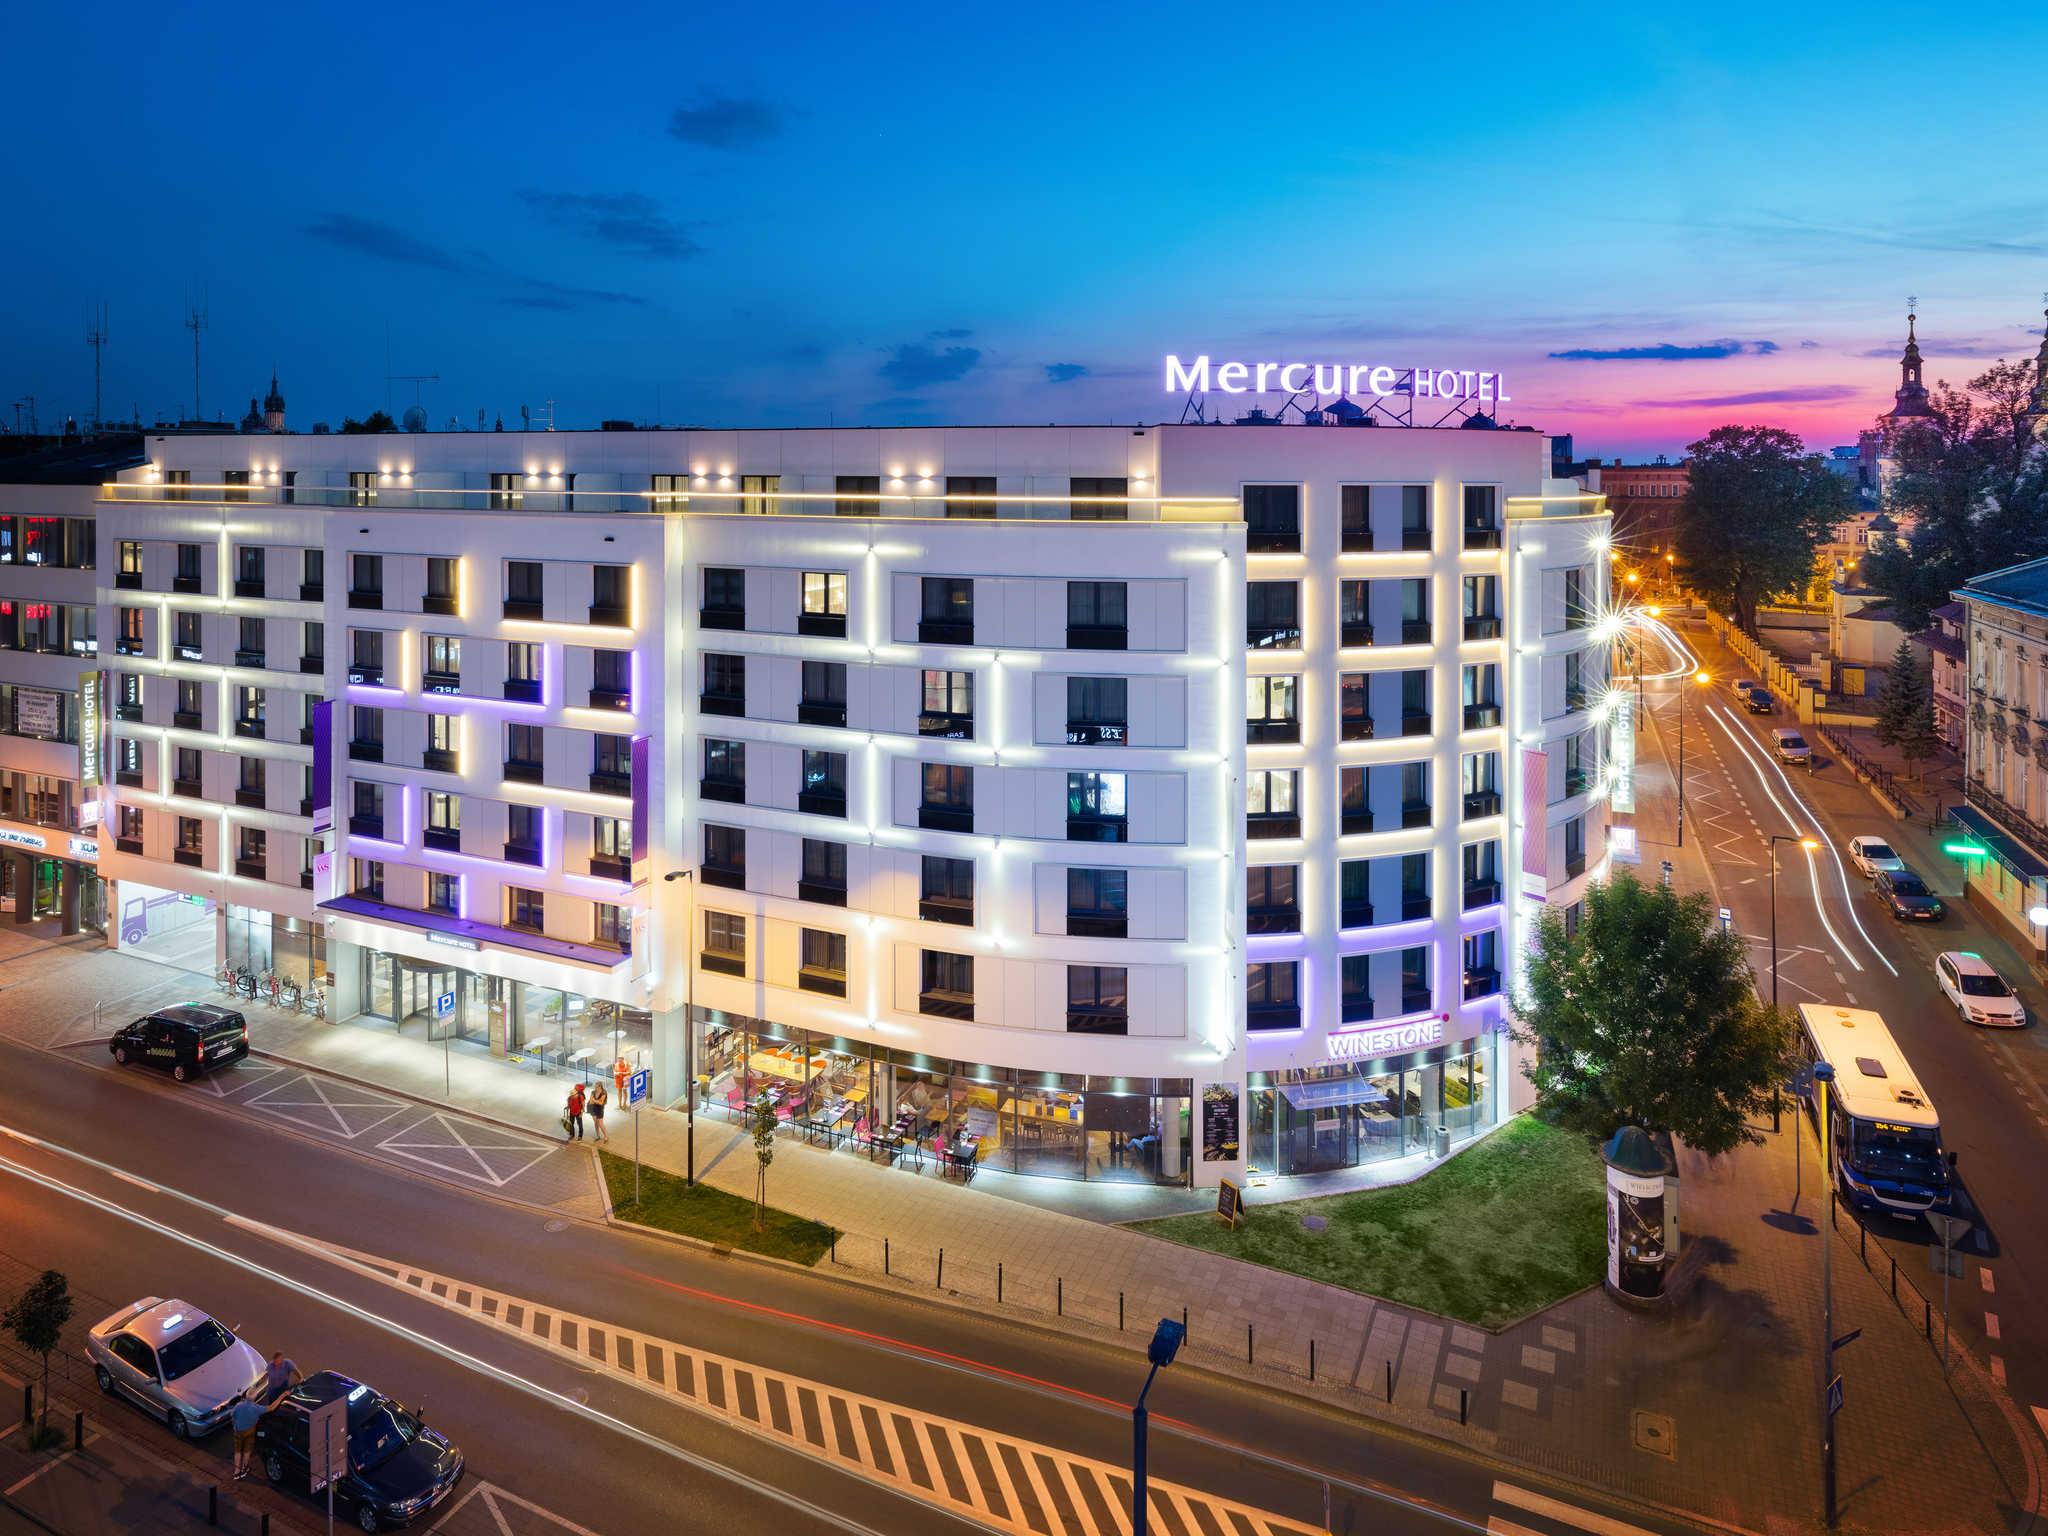 Hotel – Hotel Mercure Krakow Stare Miasto (Old Town)